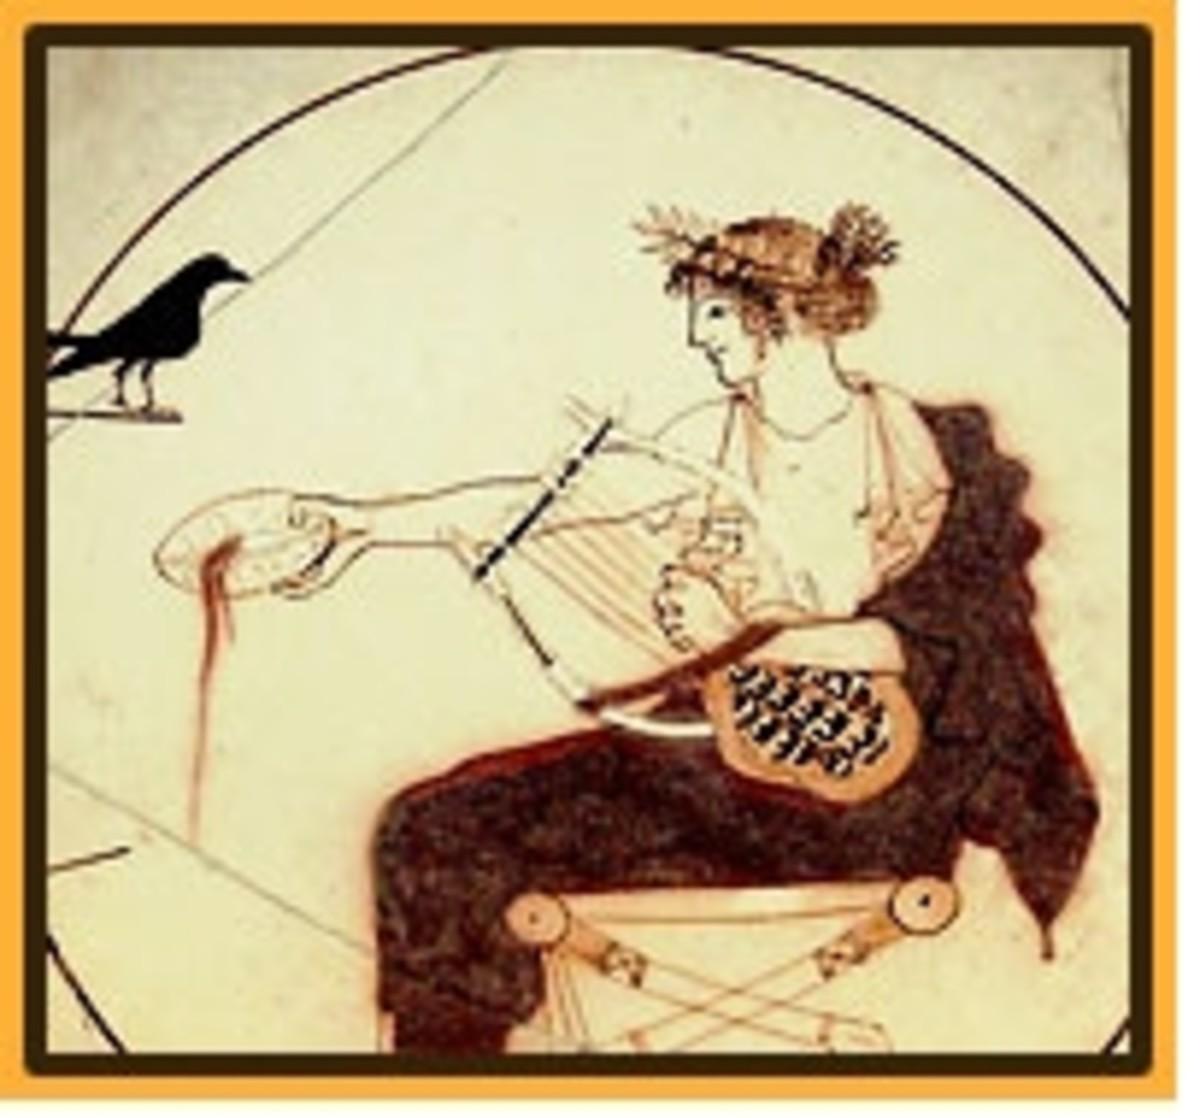 Greek god Apollo on vase found at his sanctuary in Delphi (own photo)